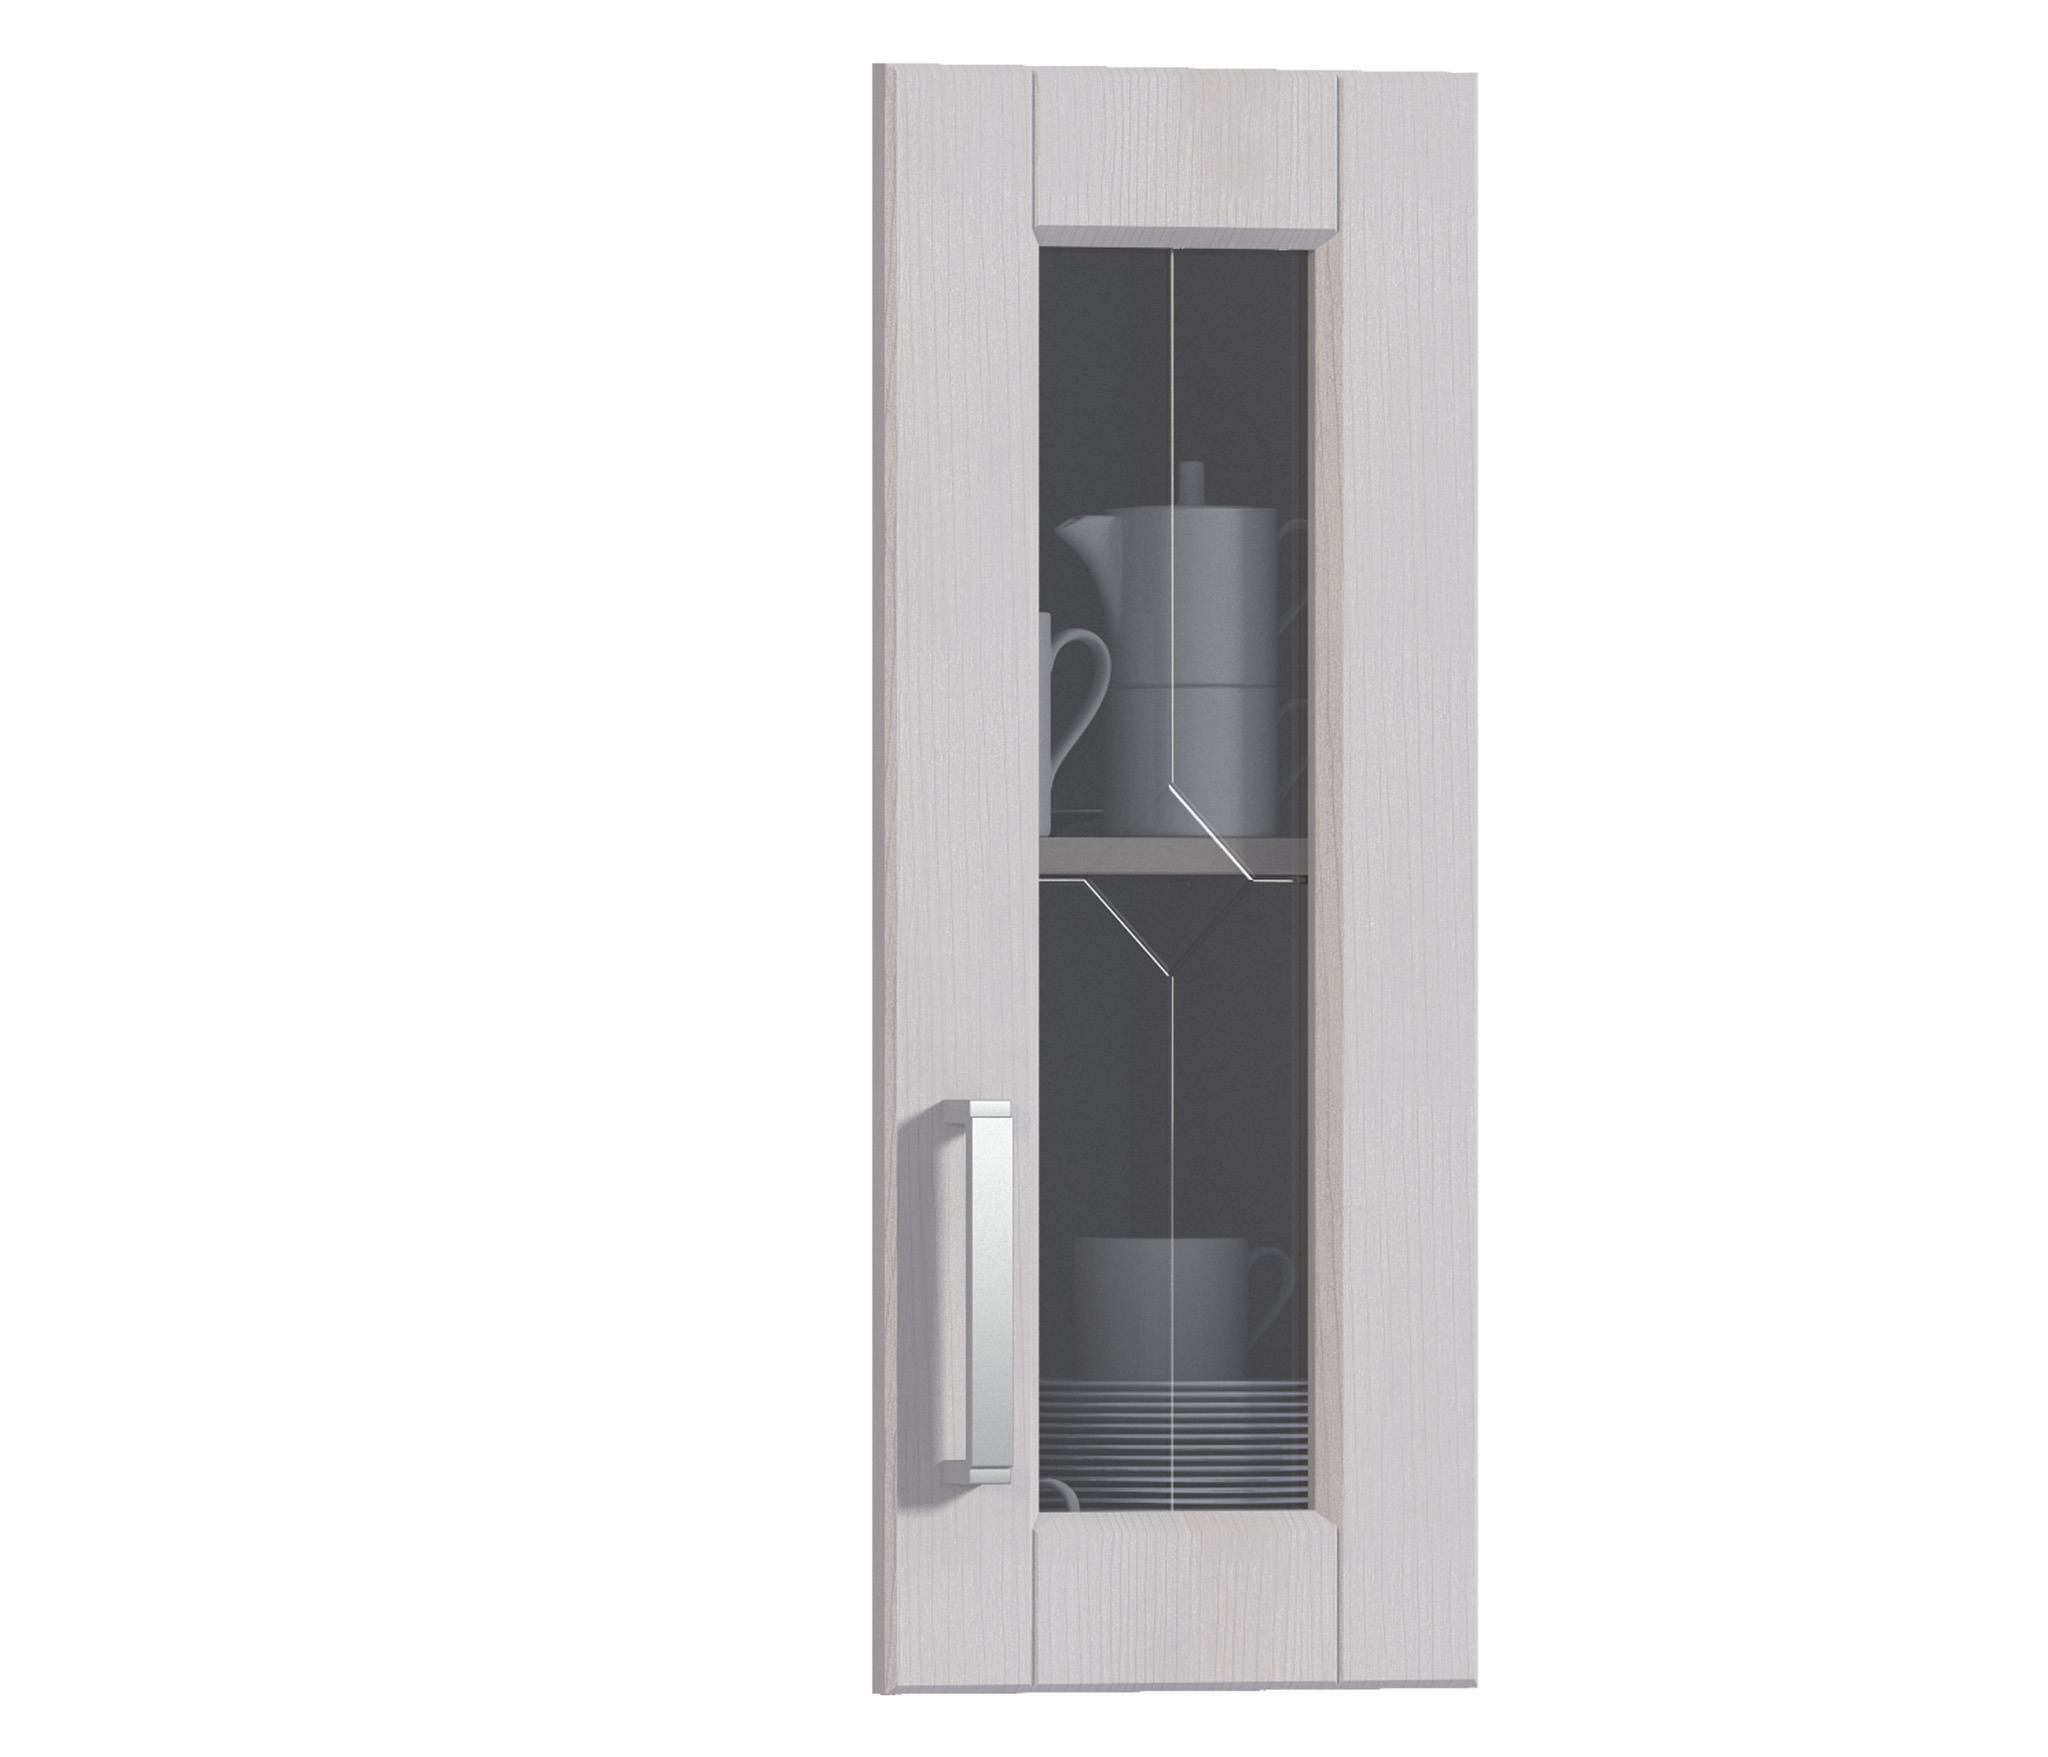 Фасад Регина ФВ-30 к корпусу РП-30, РП-60Мебель для кухни<br>Компактная застекленная дверца для кухонного шкафа.<br><br>Длина мм: 296<br>Высота мм: 713<br>Глубина мм: 22